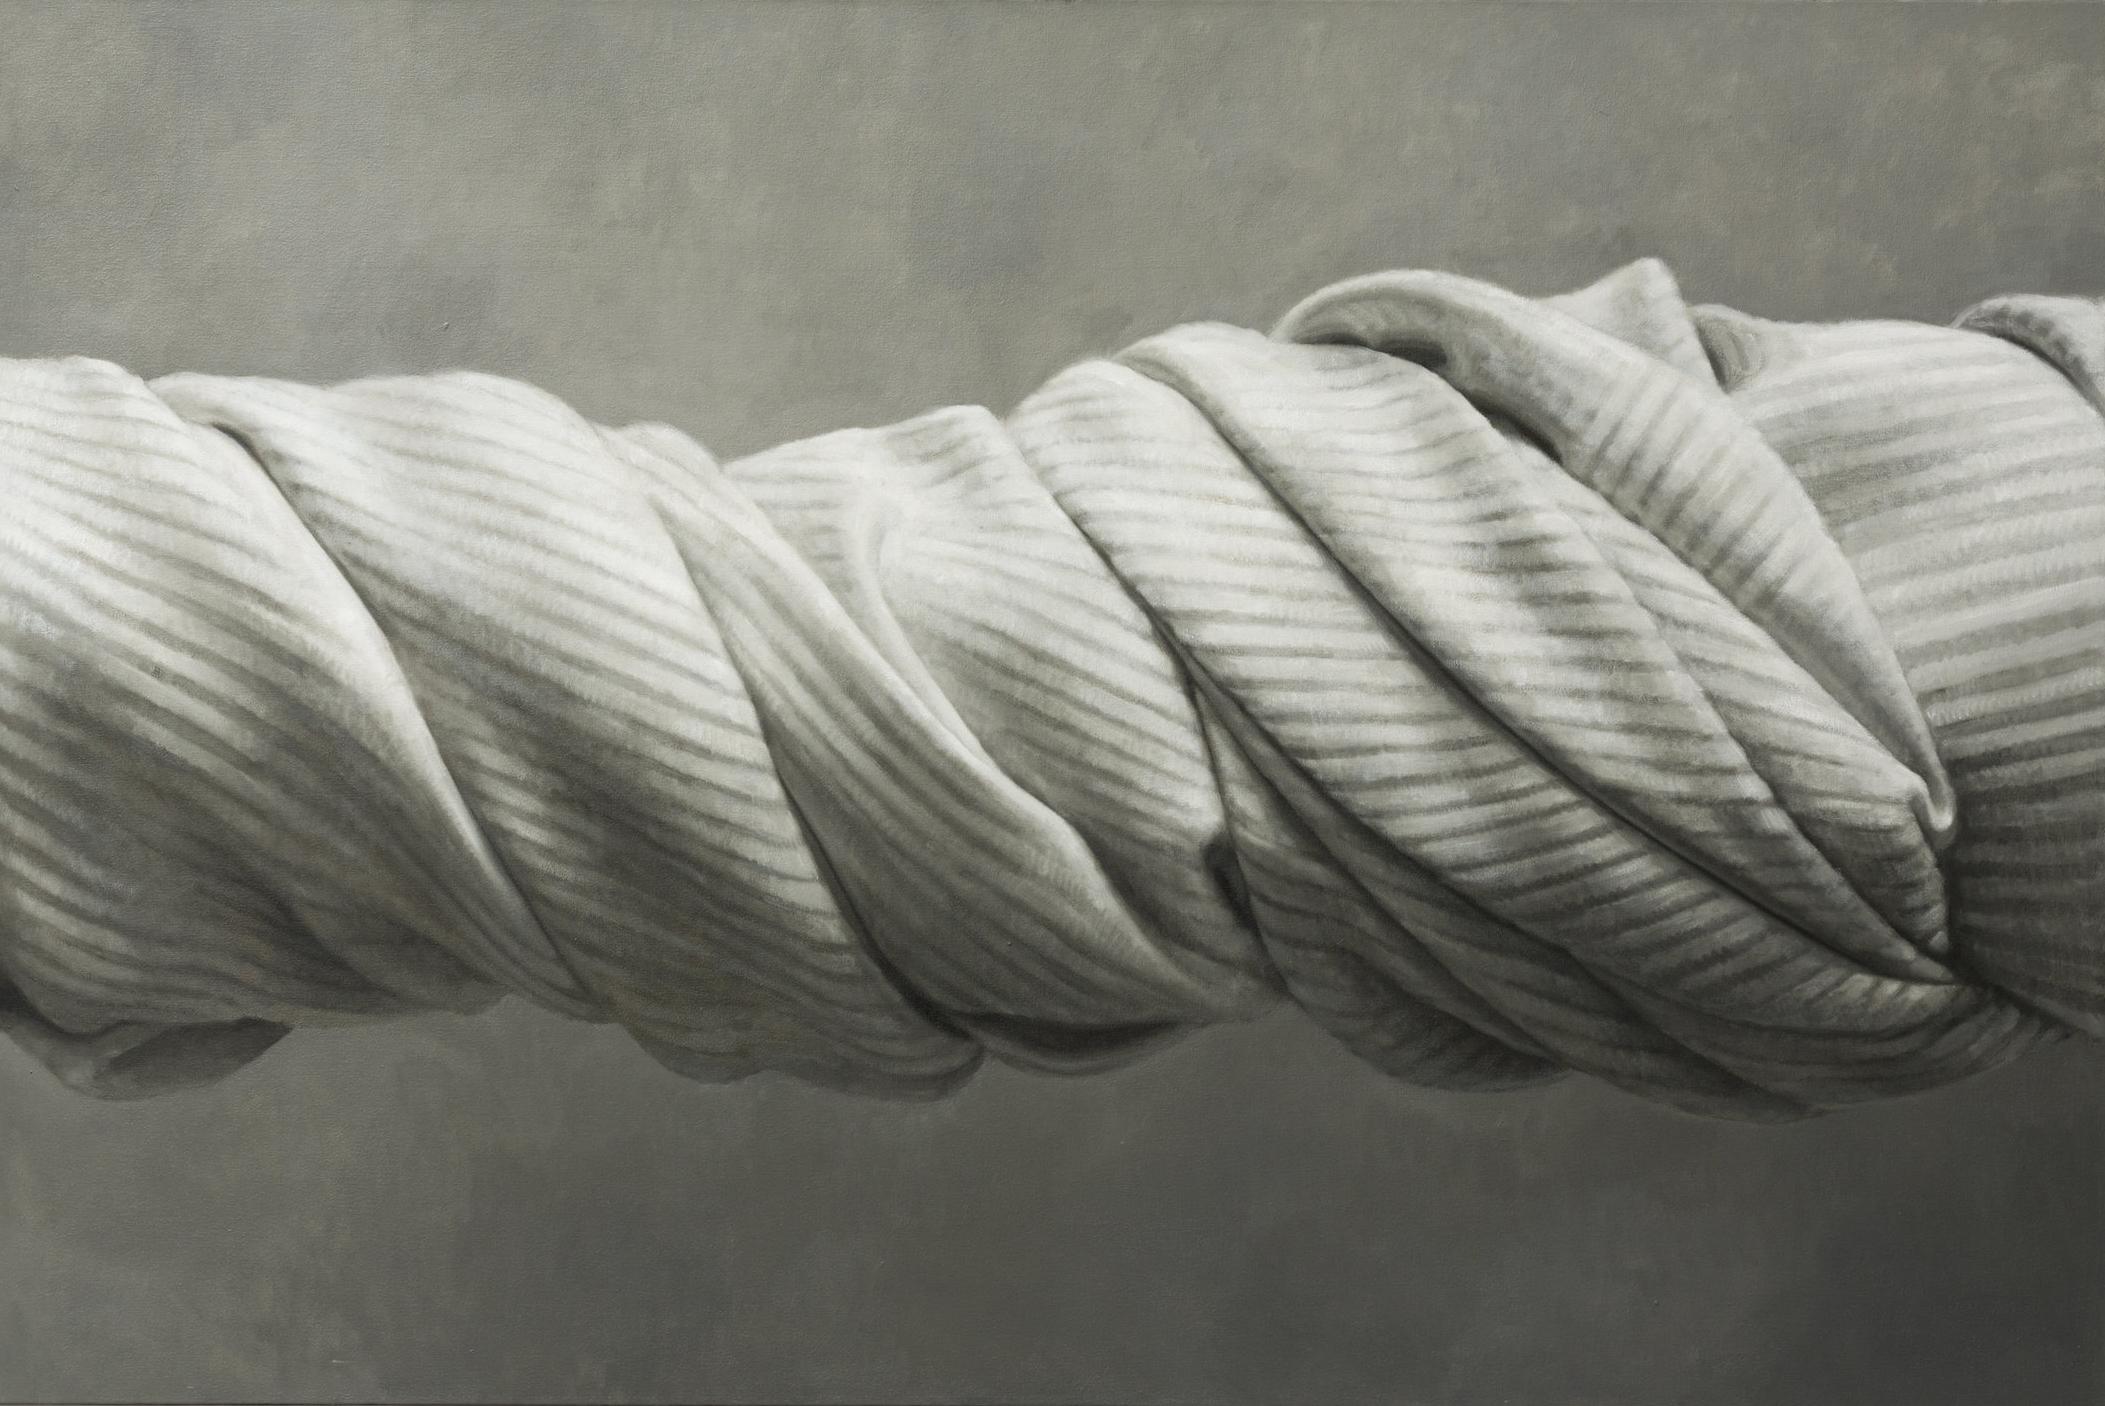 Virago, 1994, oil on canvas, 1220mm x 1845mm